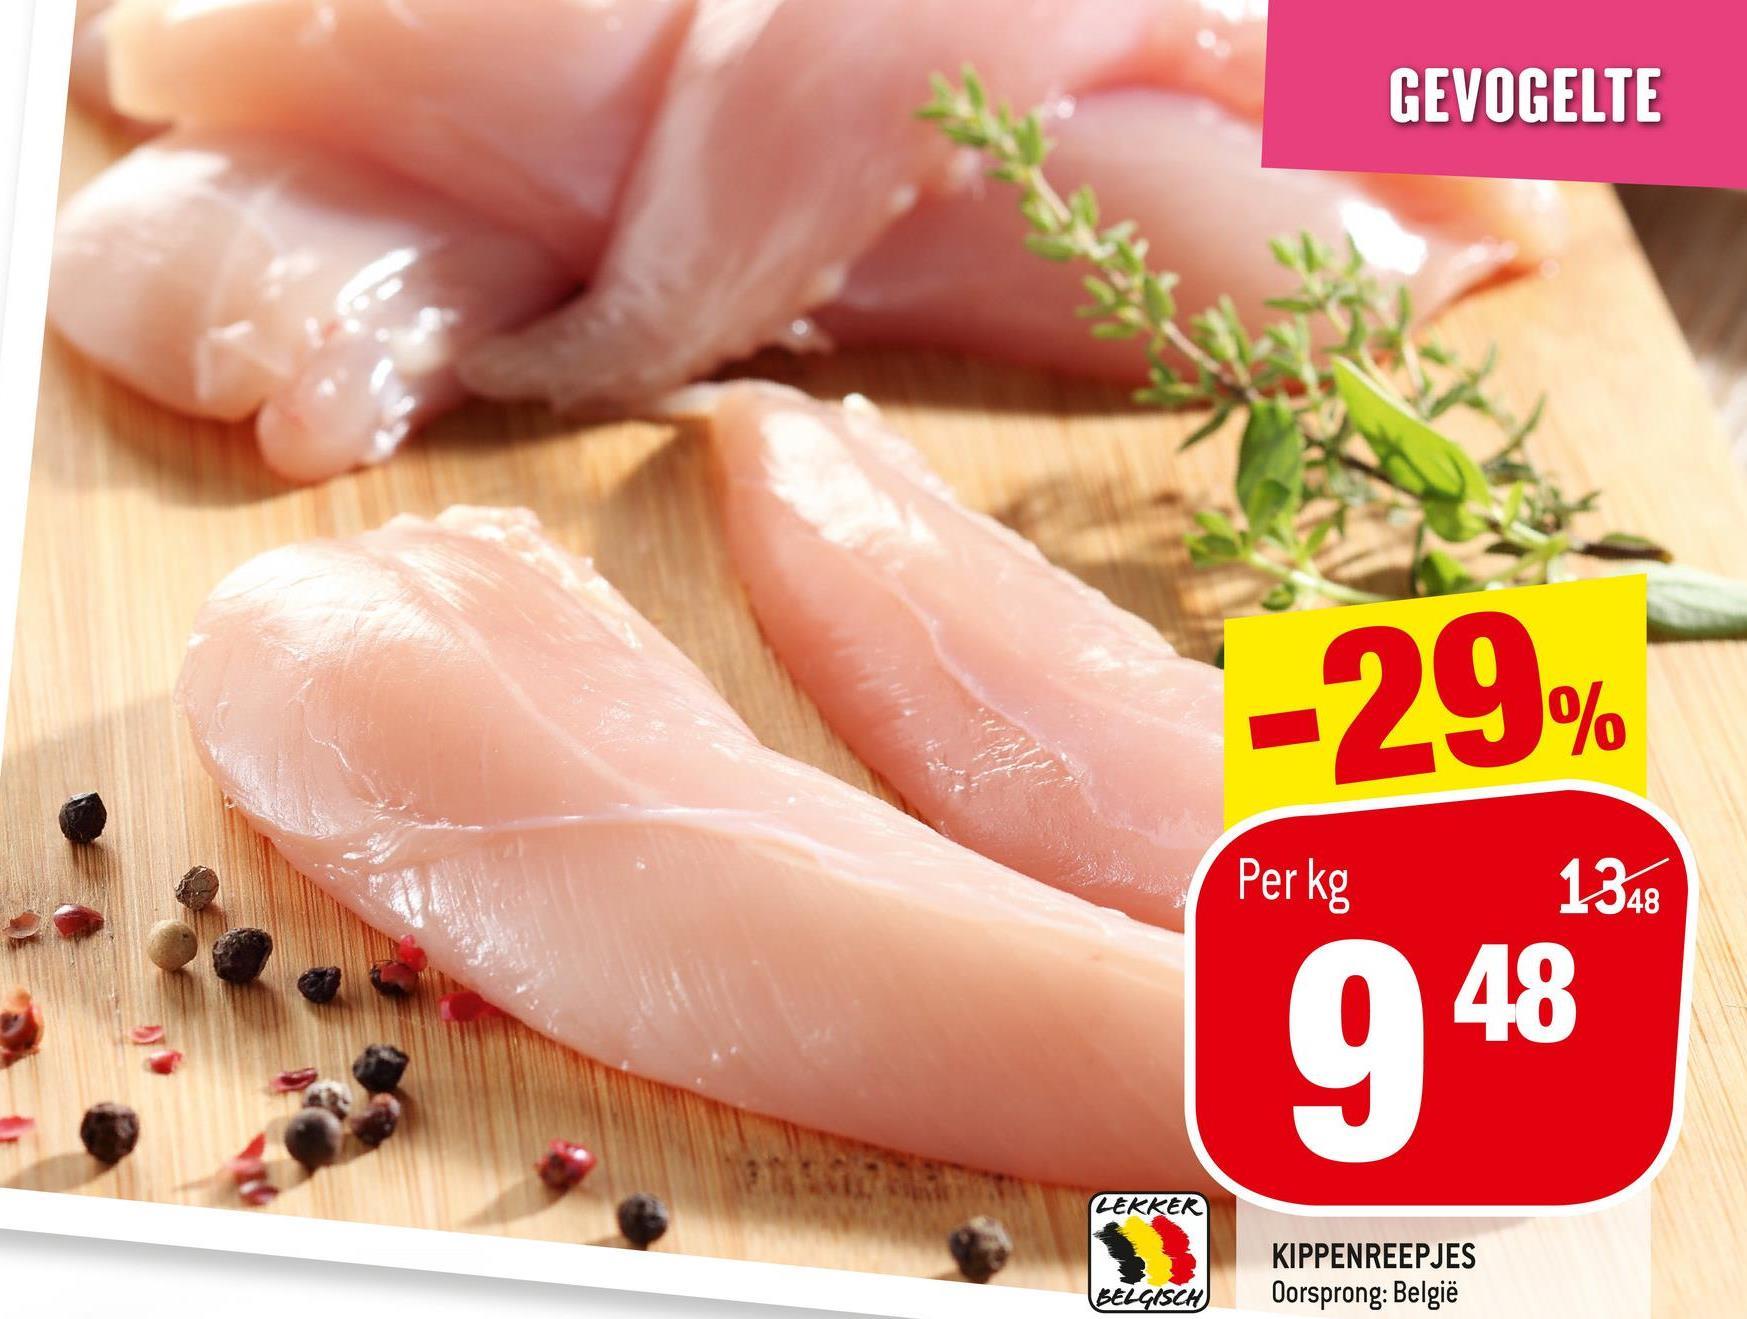 GEVOGELTE -29% Per kg 1348 948 LEKKER KIPPENREEPJES Oorsprong: België BELGISCH